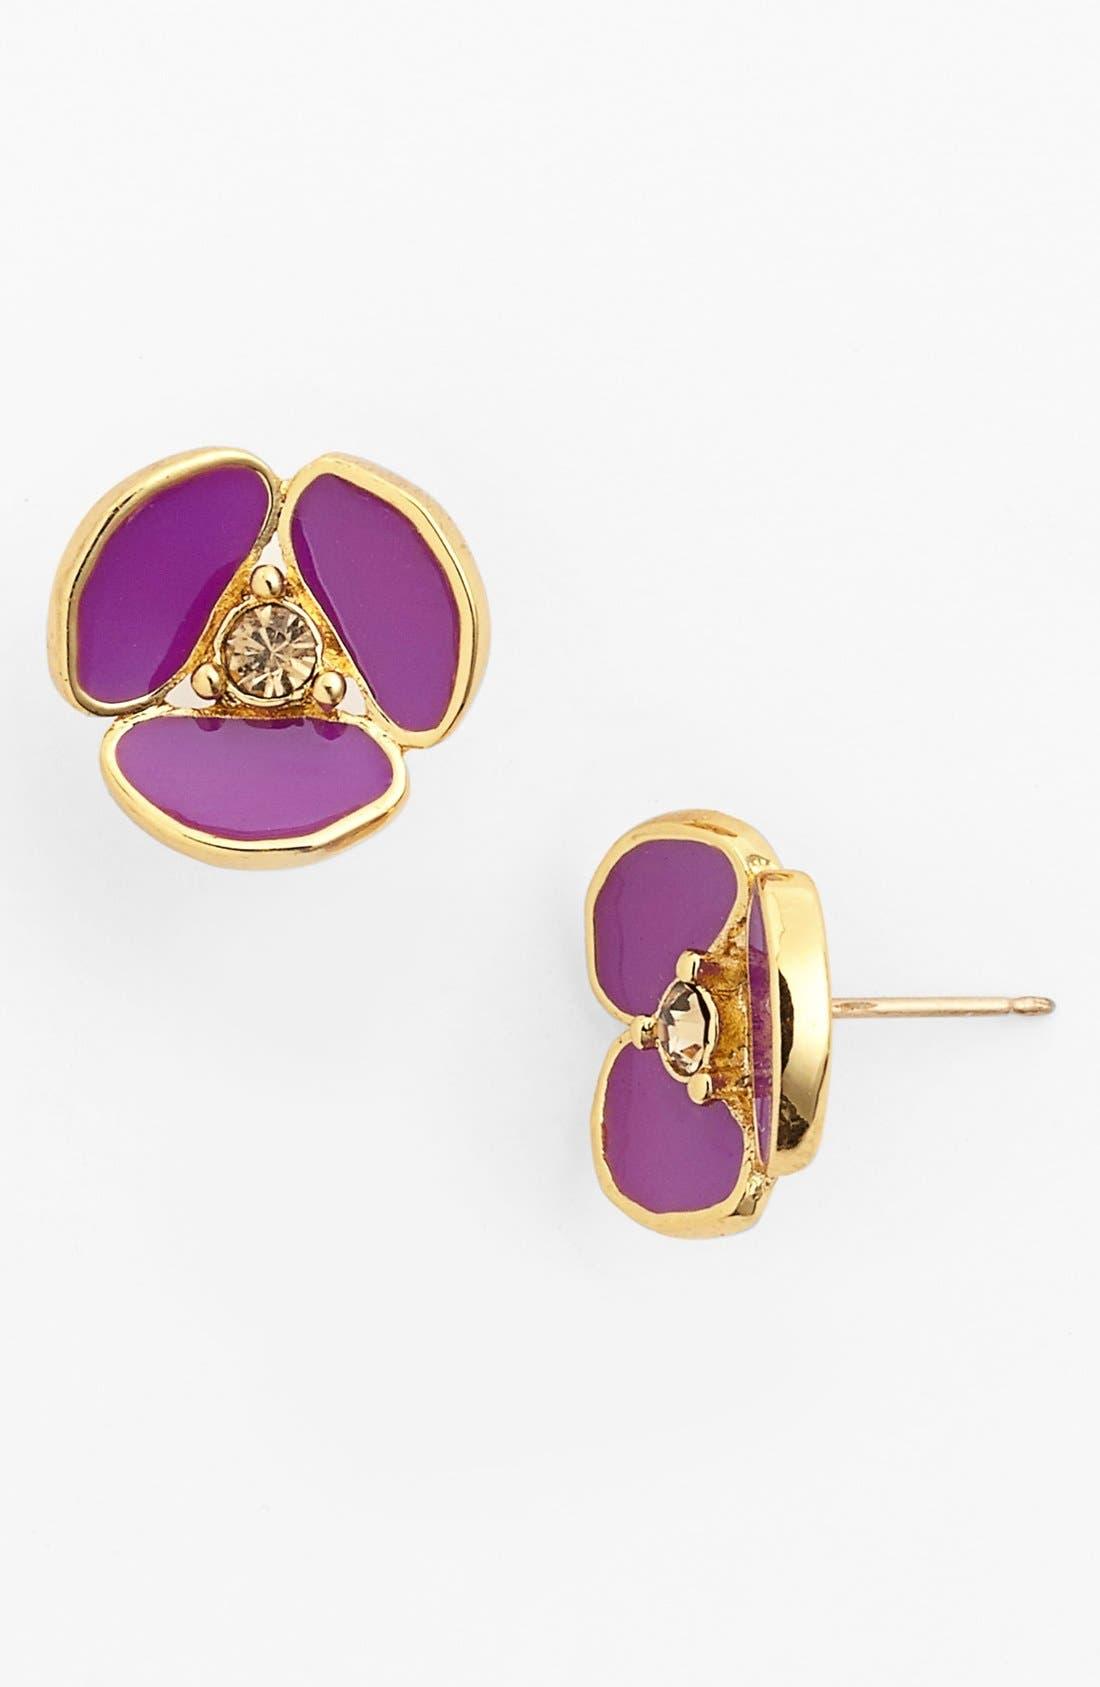 Main Image - kate spade new york 'disco pansy' stud earrings